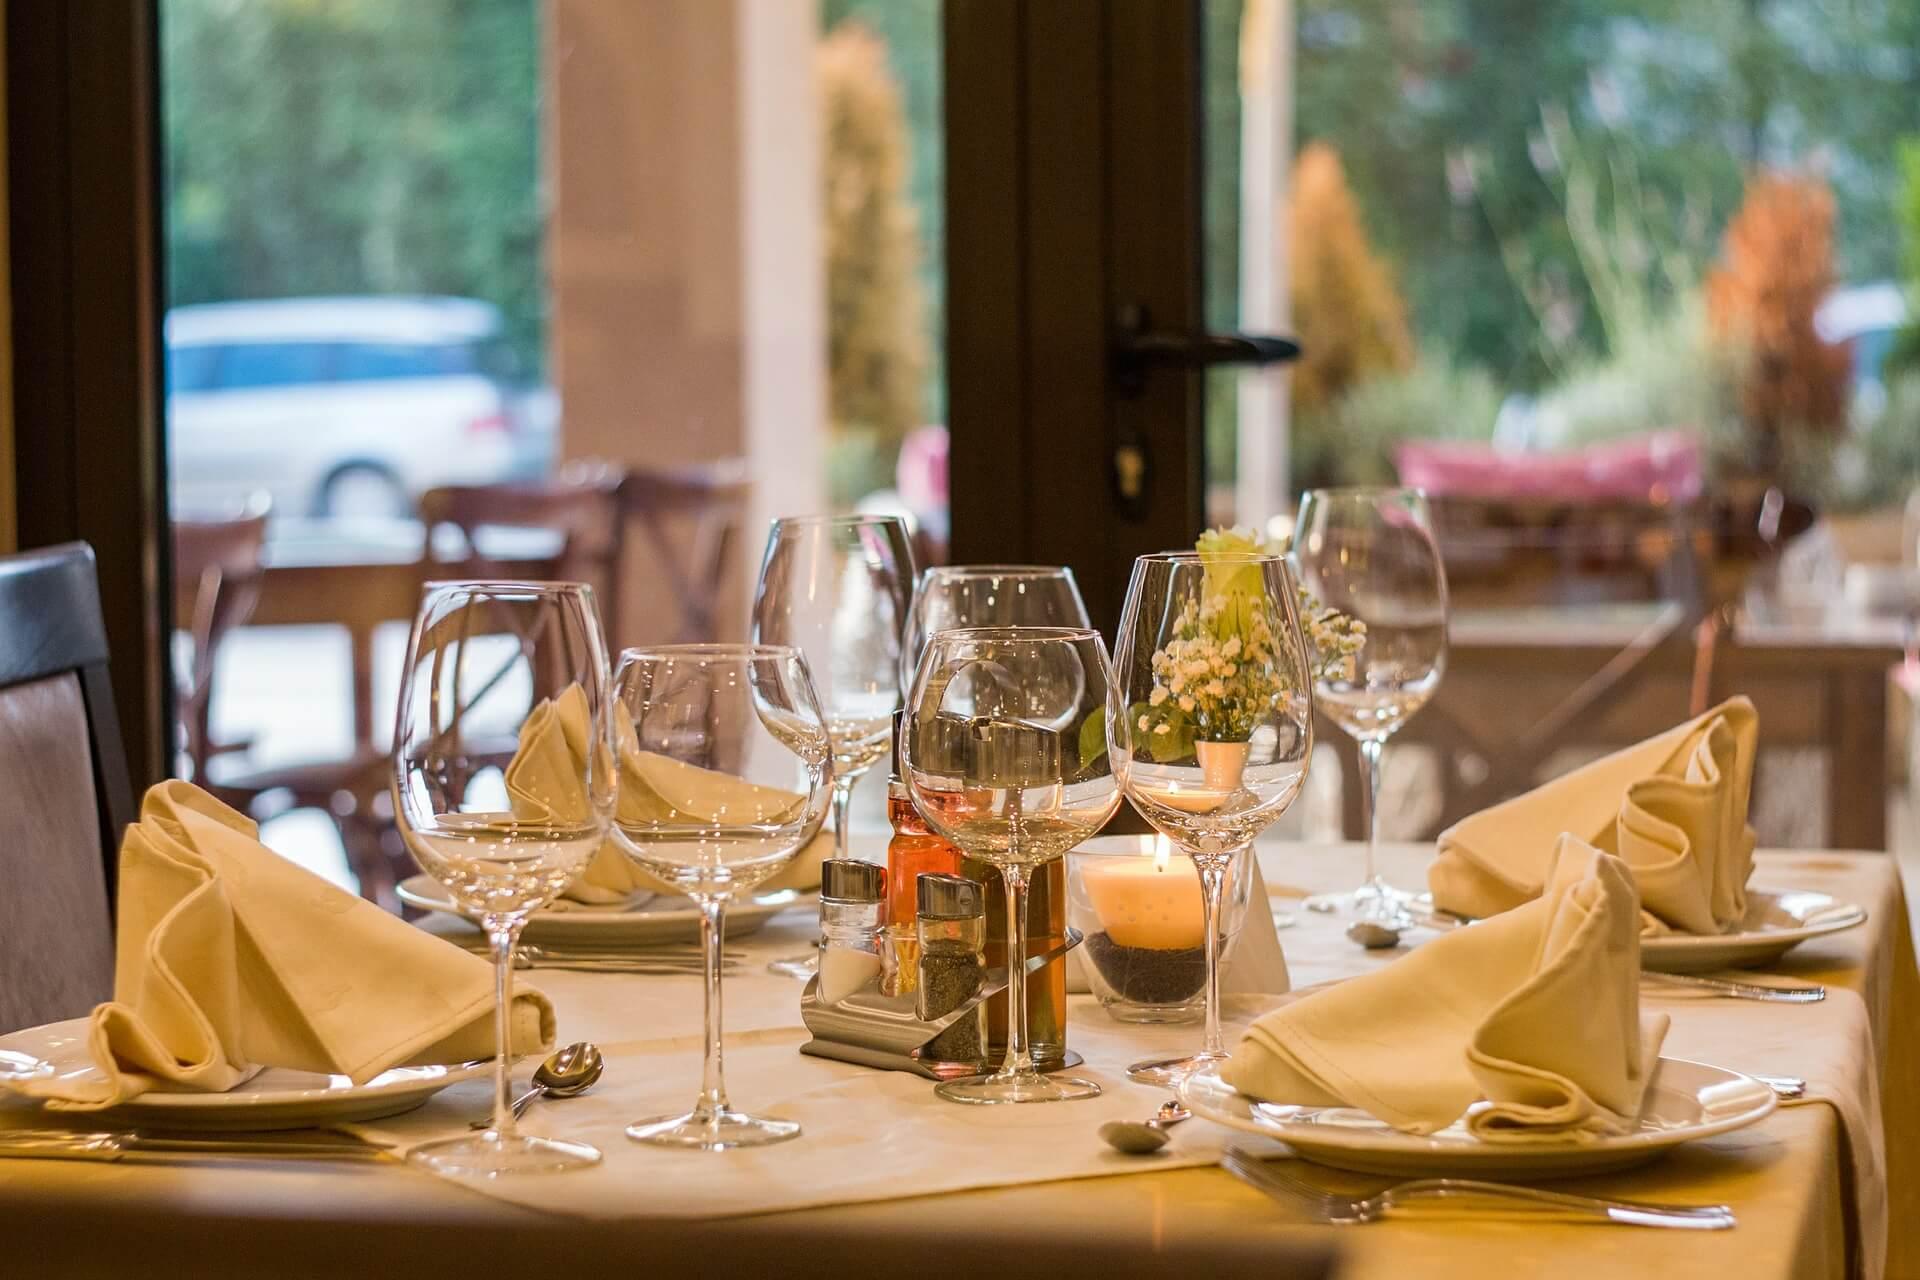 restaurant-449952_1920 (3)